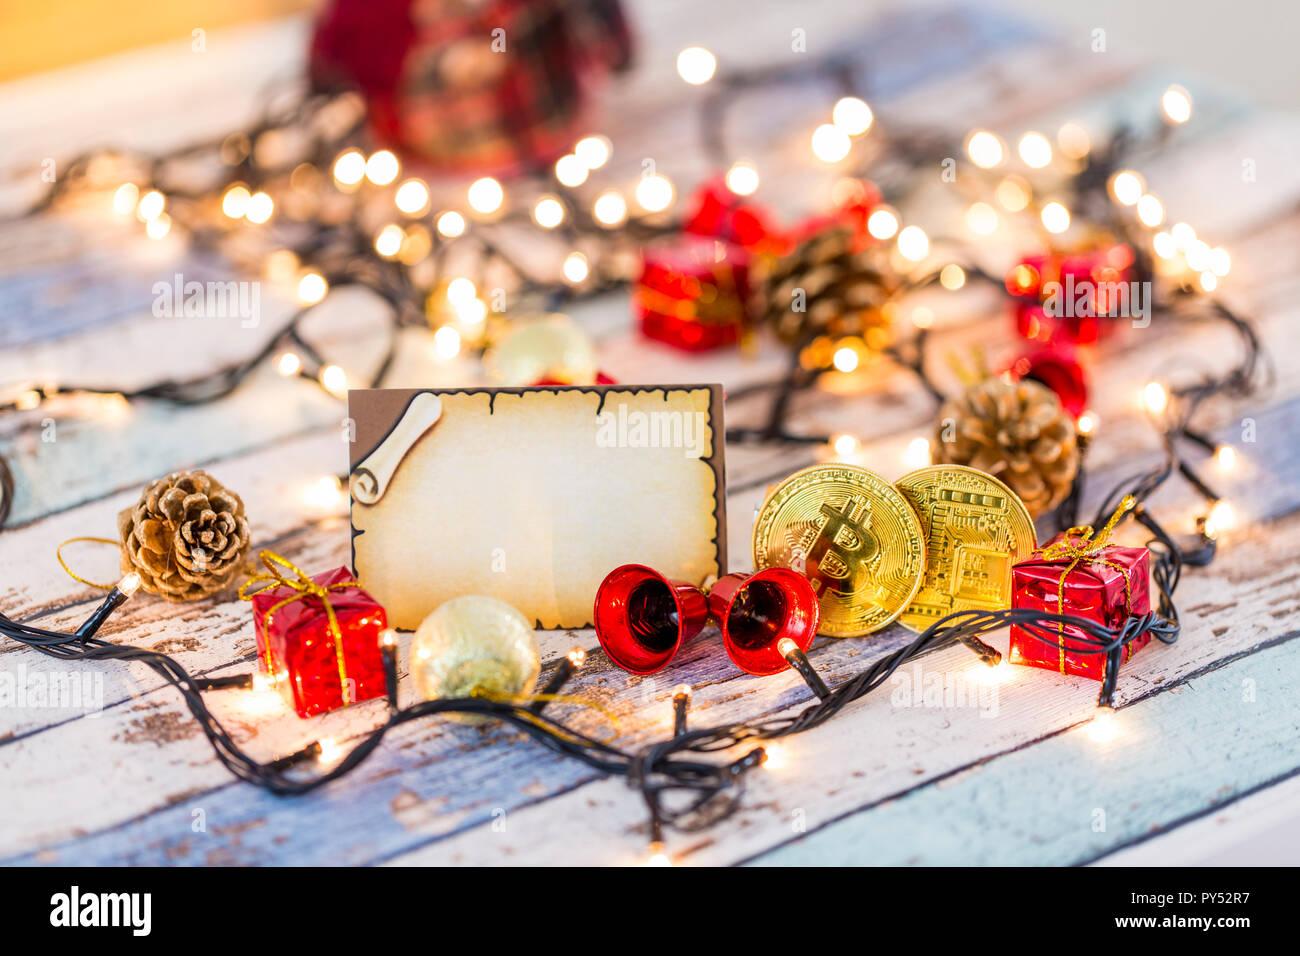 Virtual Gift Card Stock Photos & Virtual Gift Card Stock Images - Alamy